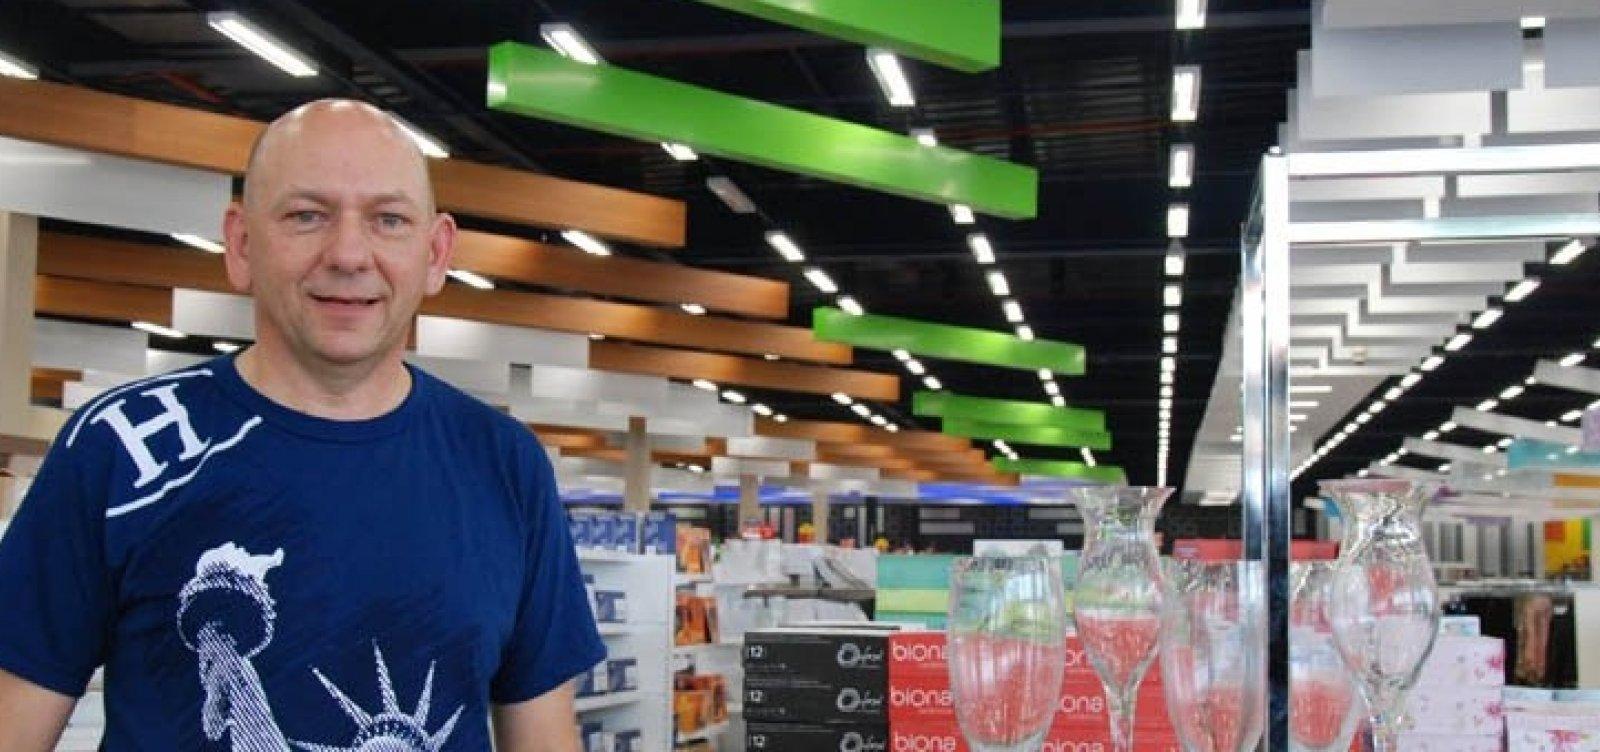 Dono da Havan nega manobra considerada irregular pela Receita Federal